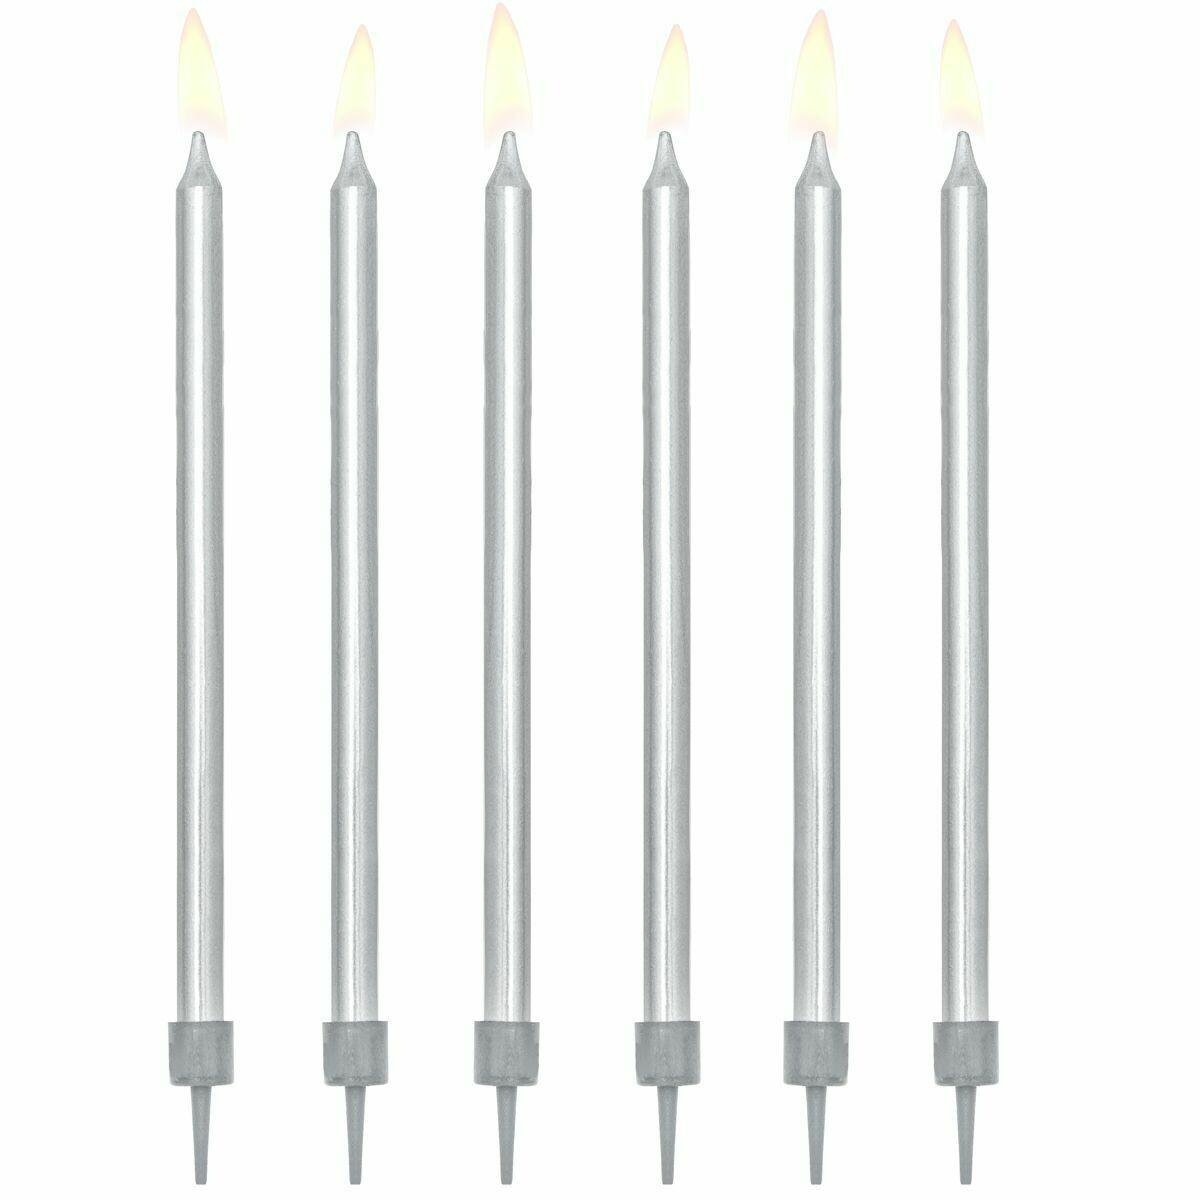 PartyDeco Birthday Candles -12εκ PLAIN SILVER 12 τεμ - Ασημί κεράκια 12εκ